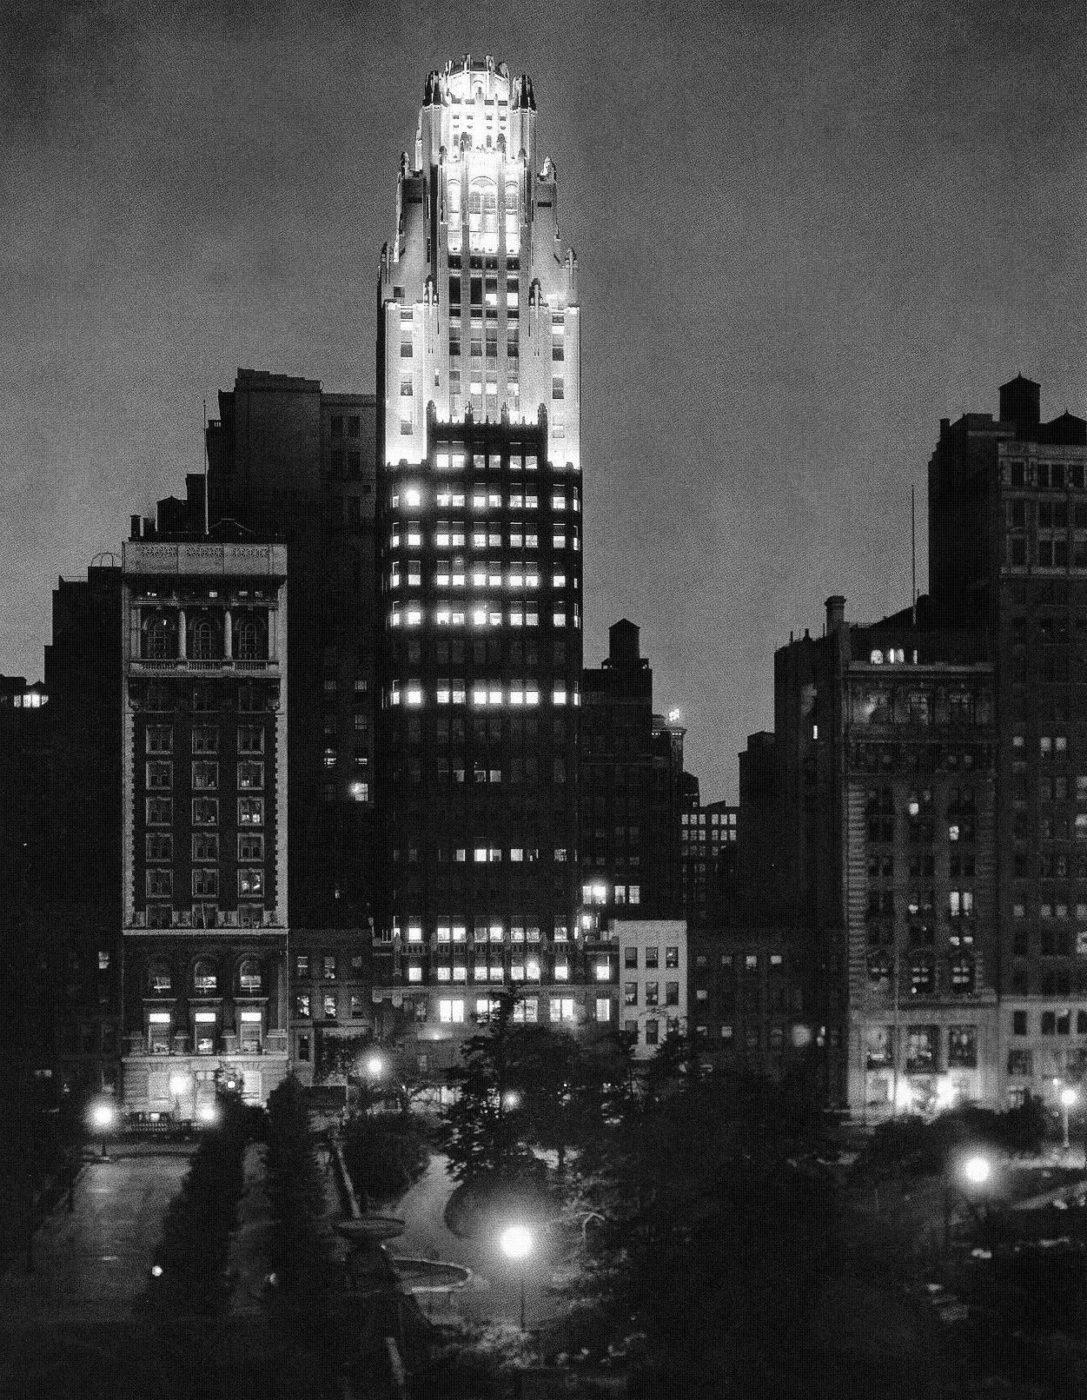 American Radiator Building at night, circa mid 1930s